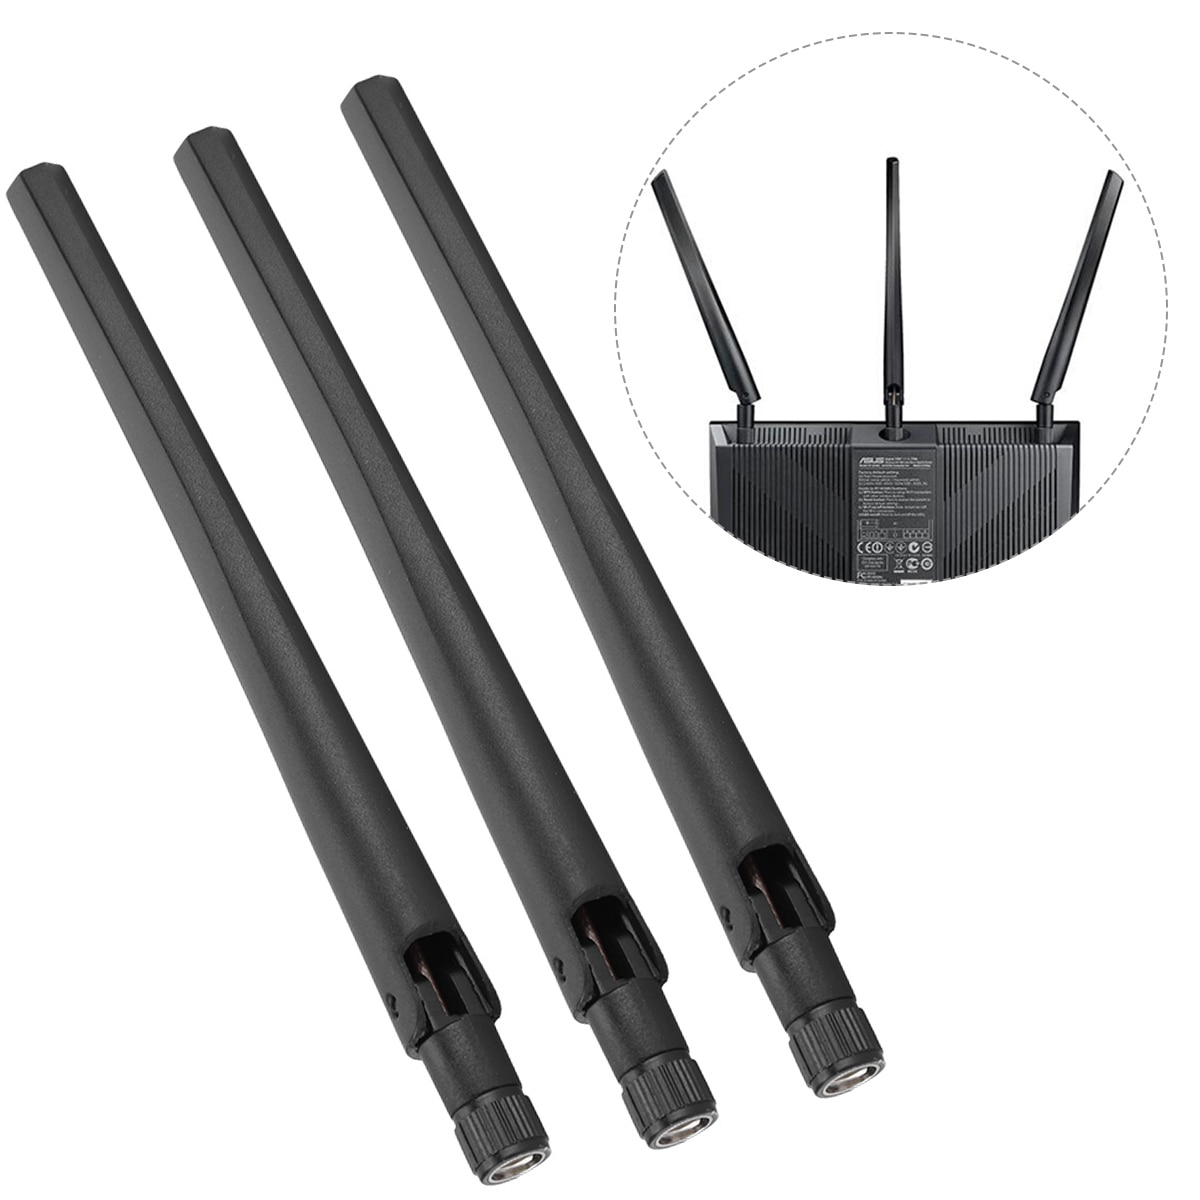 Nueva antena 3 uds Router WiFi tarjeta de red inalámbrica de doble banda antena externa interfaz SMA para ASUS RT-AC68u